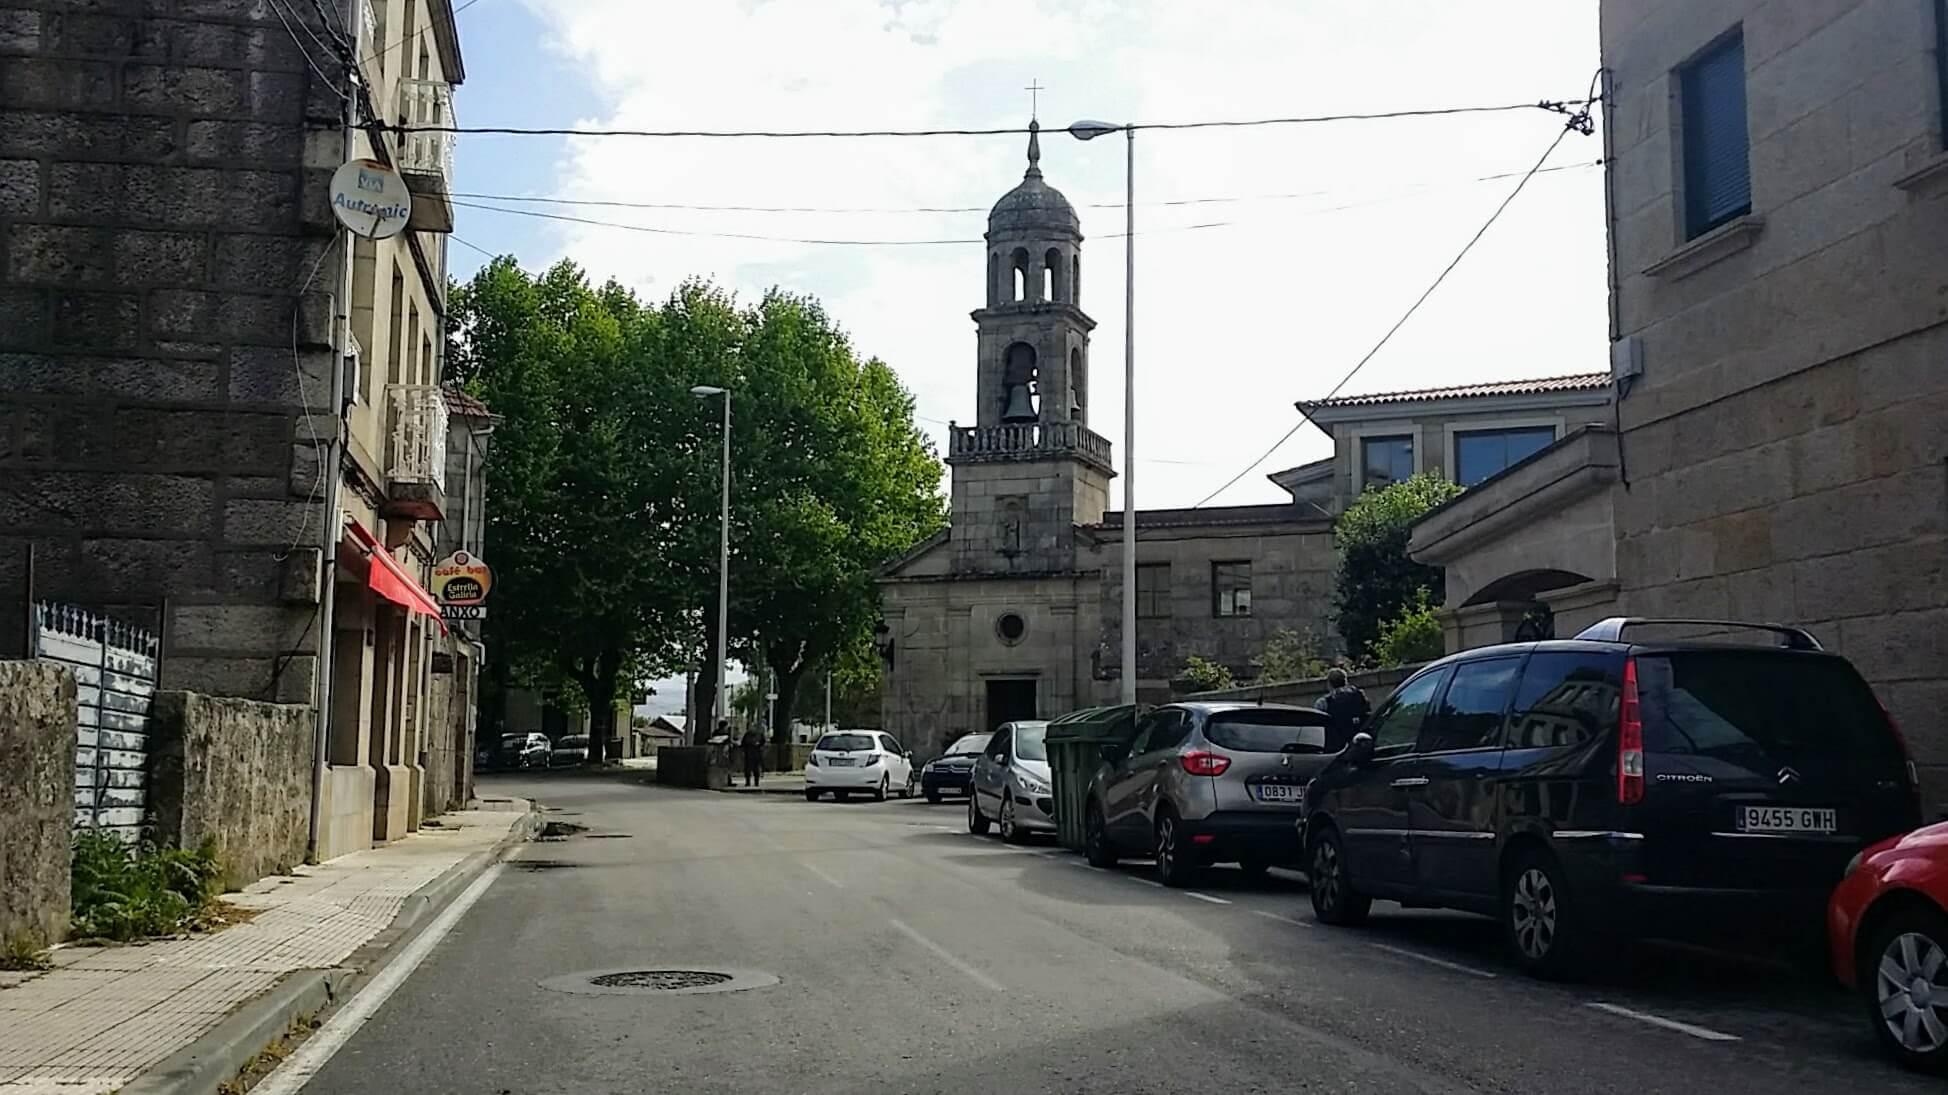 Walk by the Parroquia de San Andrés de Comesaña on day twenty-one of the Camino Portugués